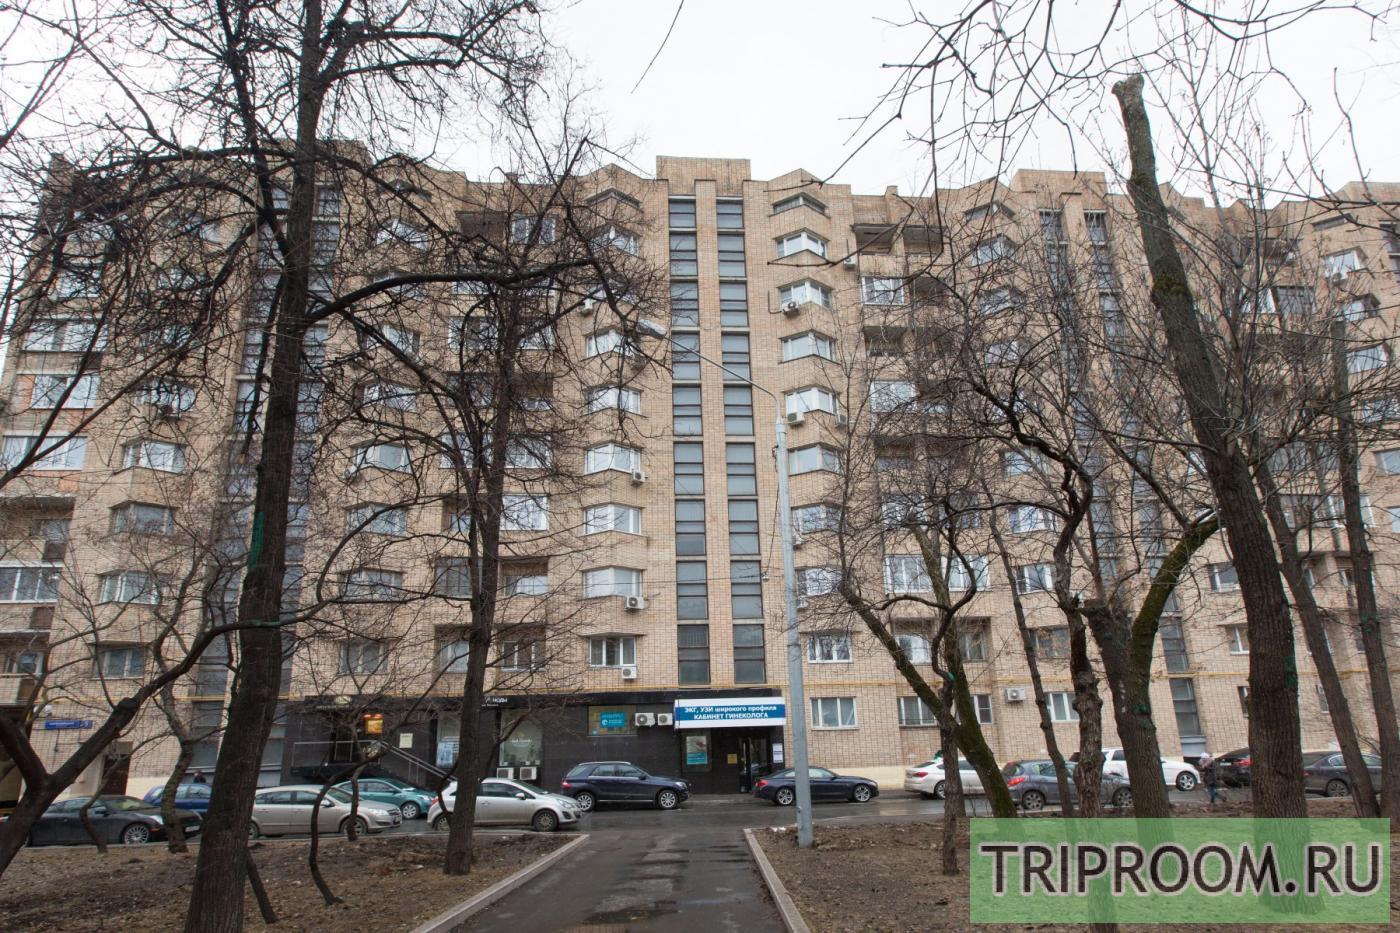 1-комнатная квартира посуточно (вариант № 34591), ул. Карманицкий переулок, фото № 12